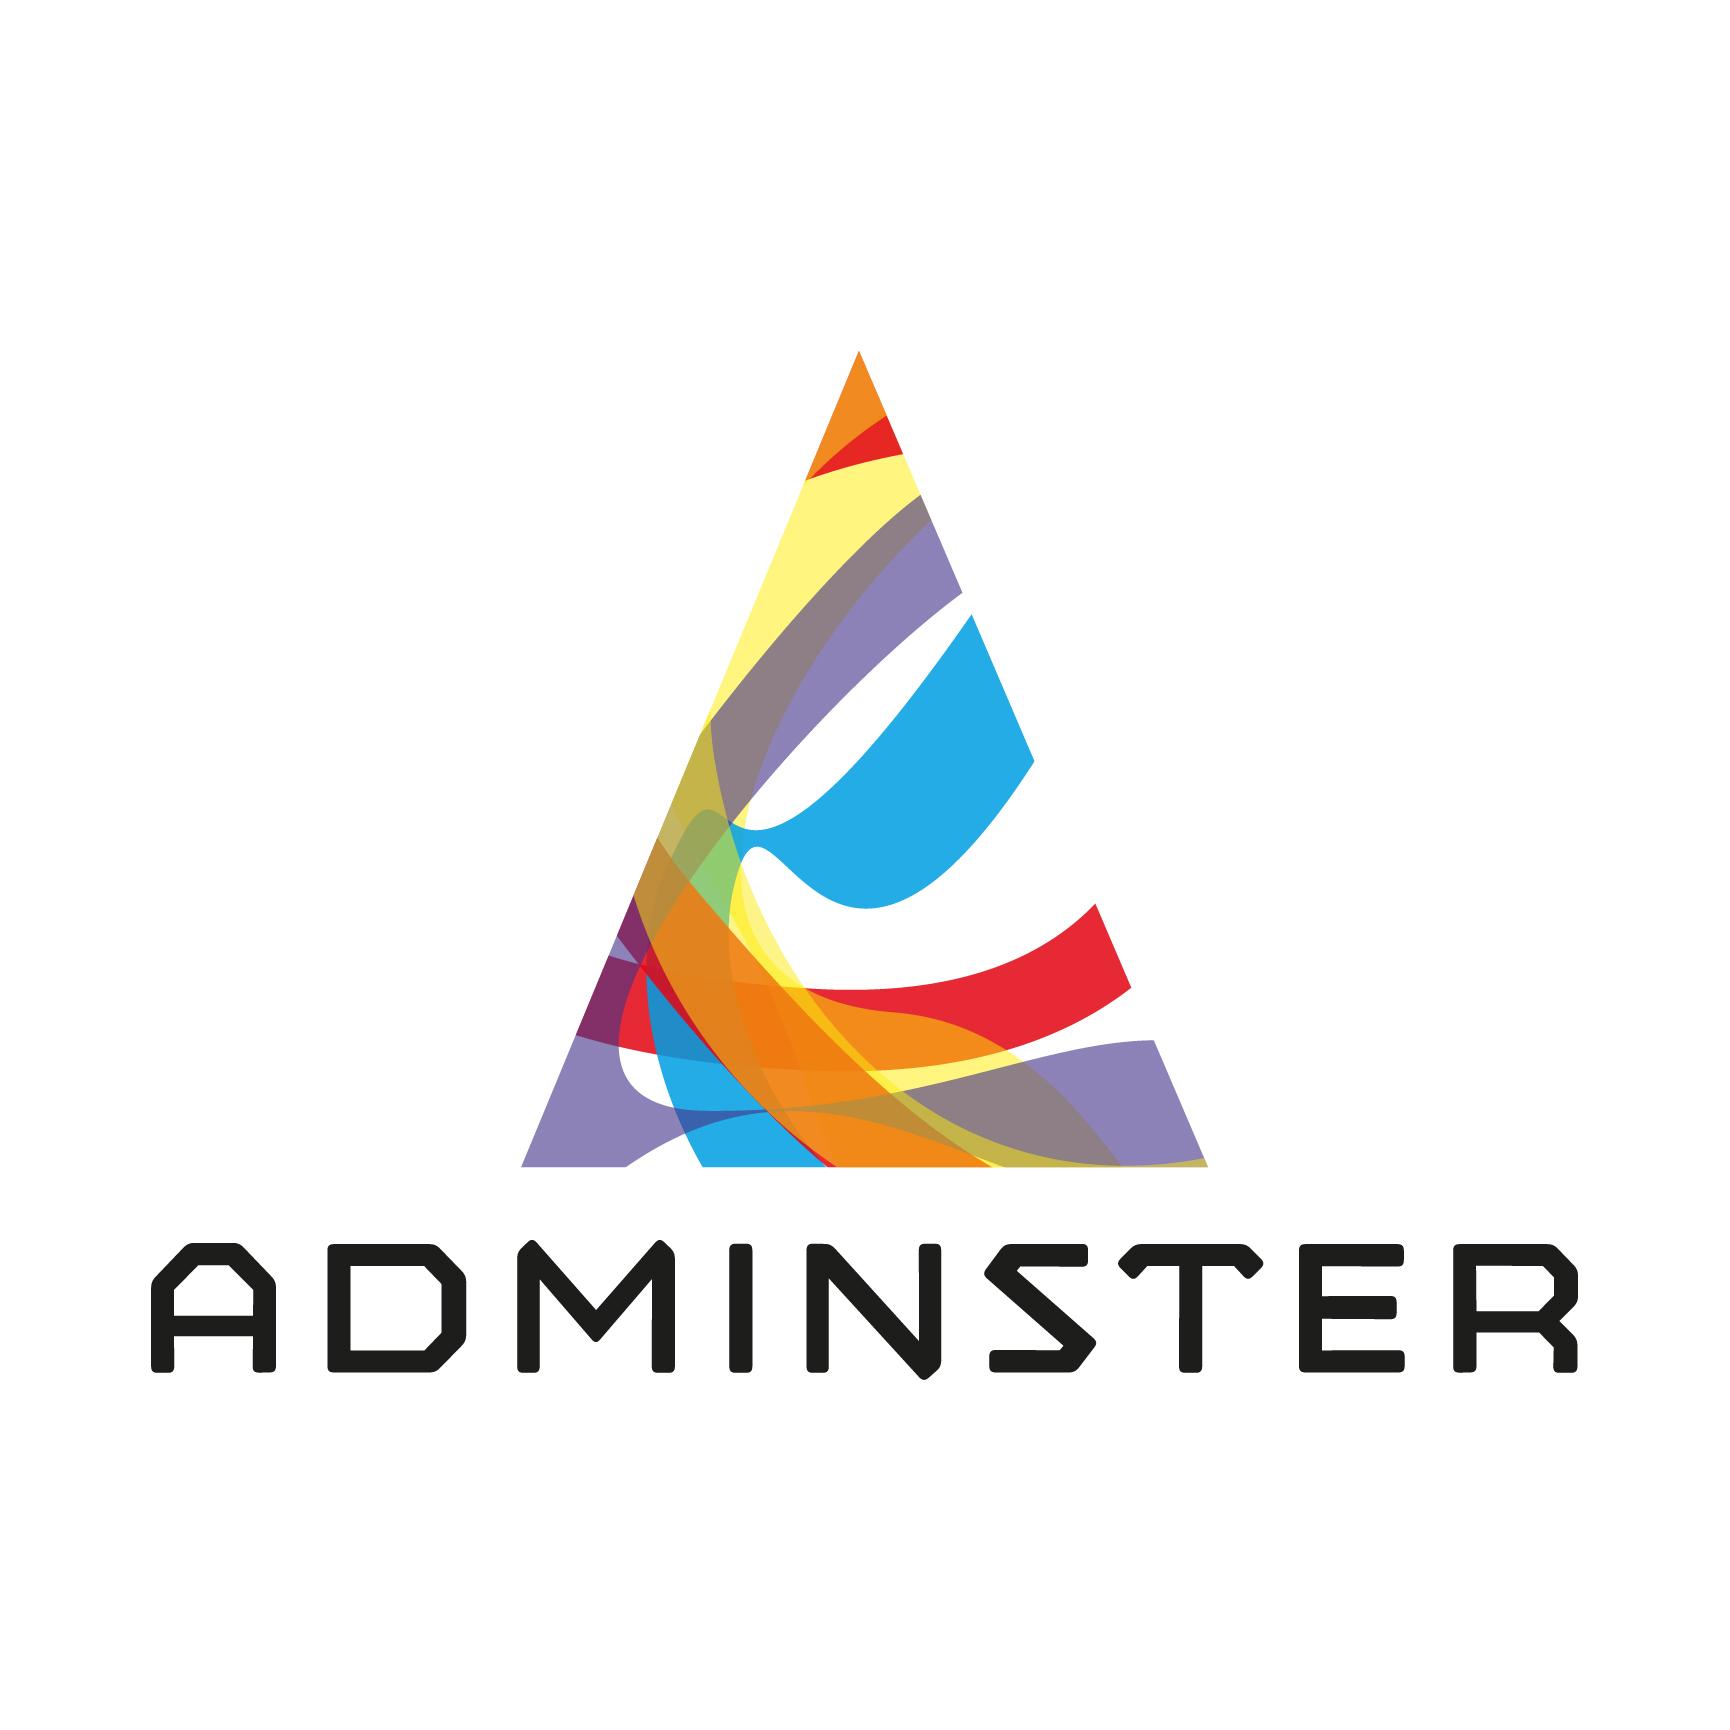 ADMINSTER creative agency logo